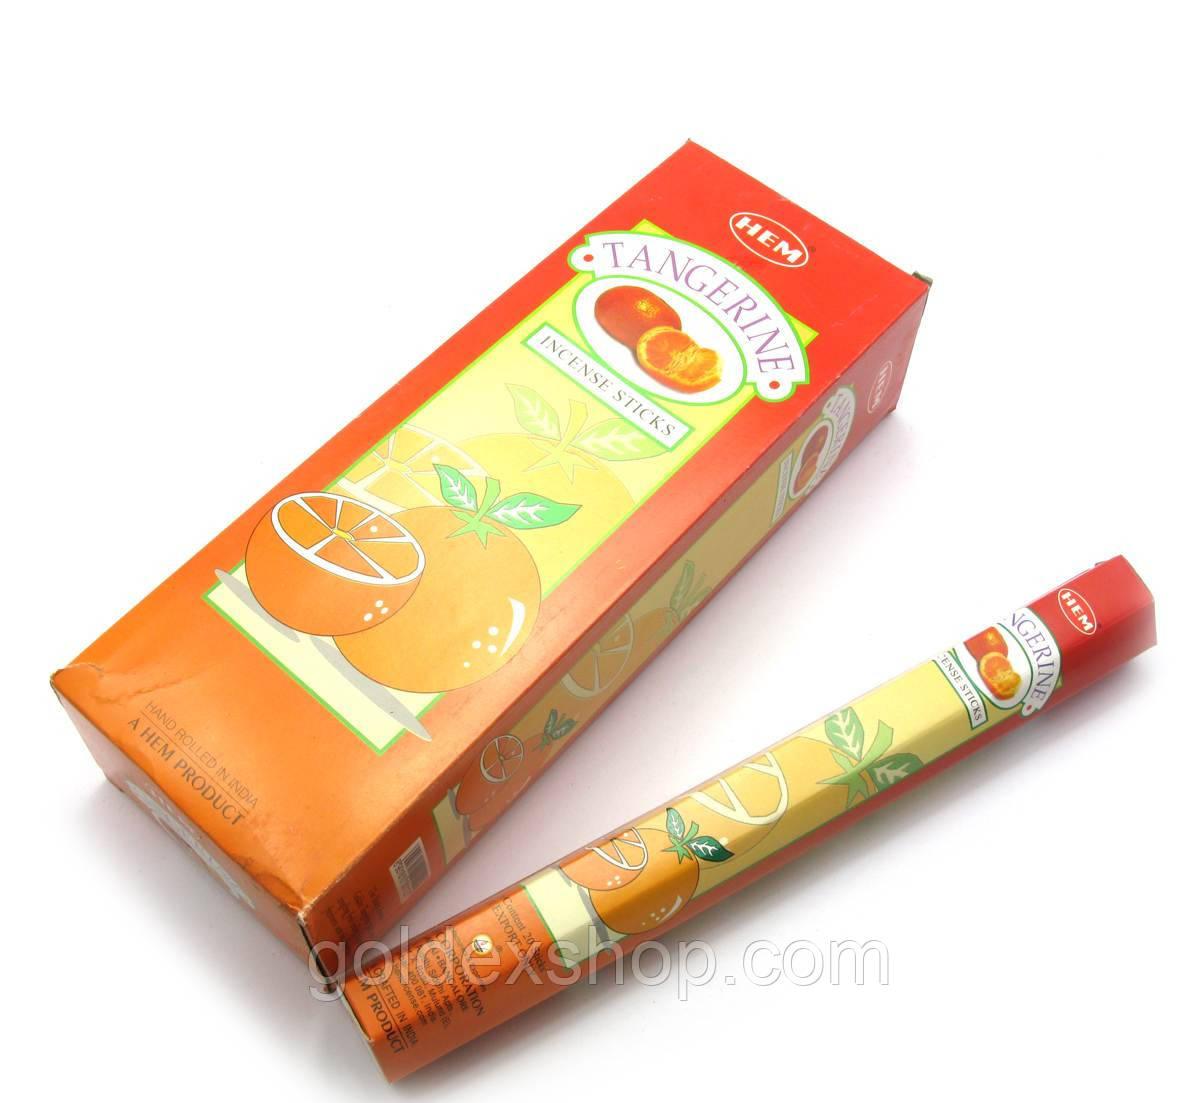 Tangerine (Мандарин) (Hem) шестигранник, аромапалочки